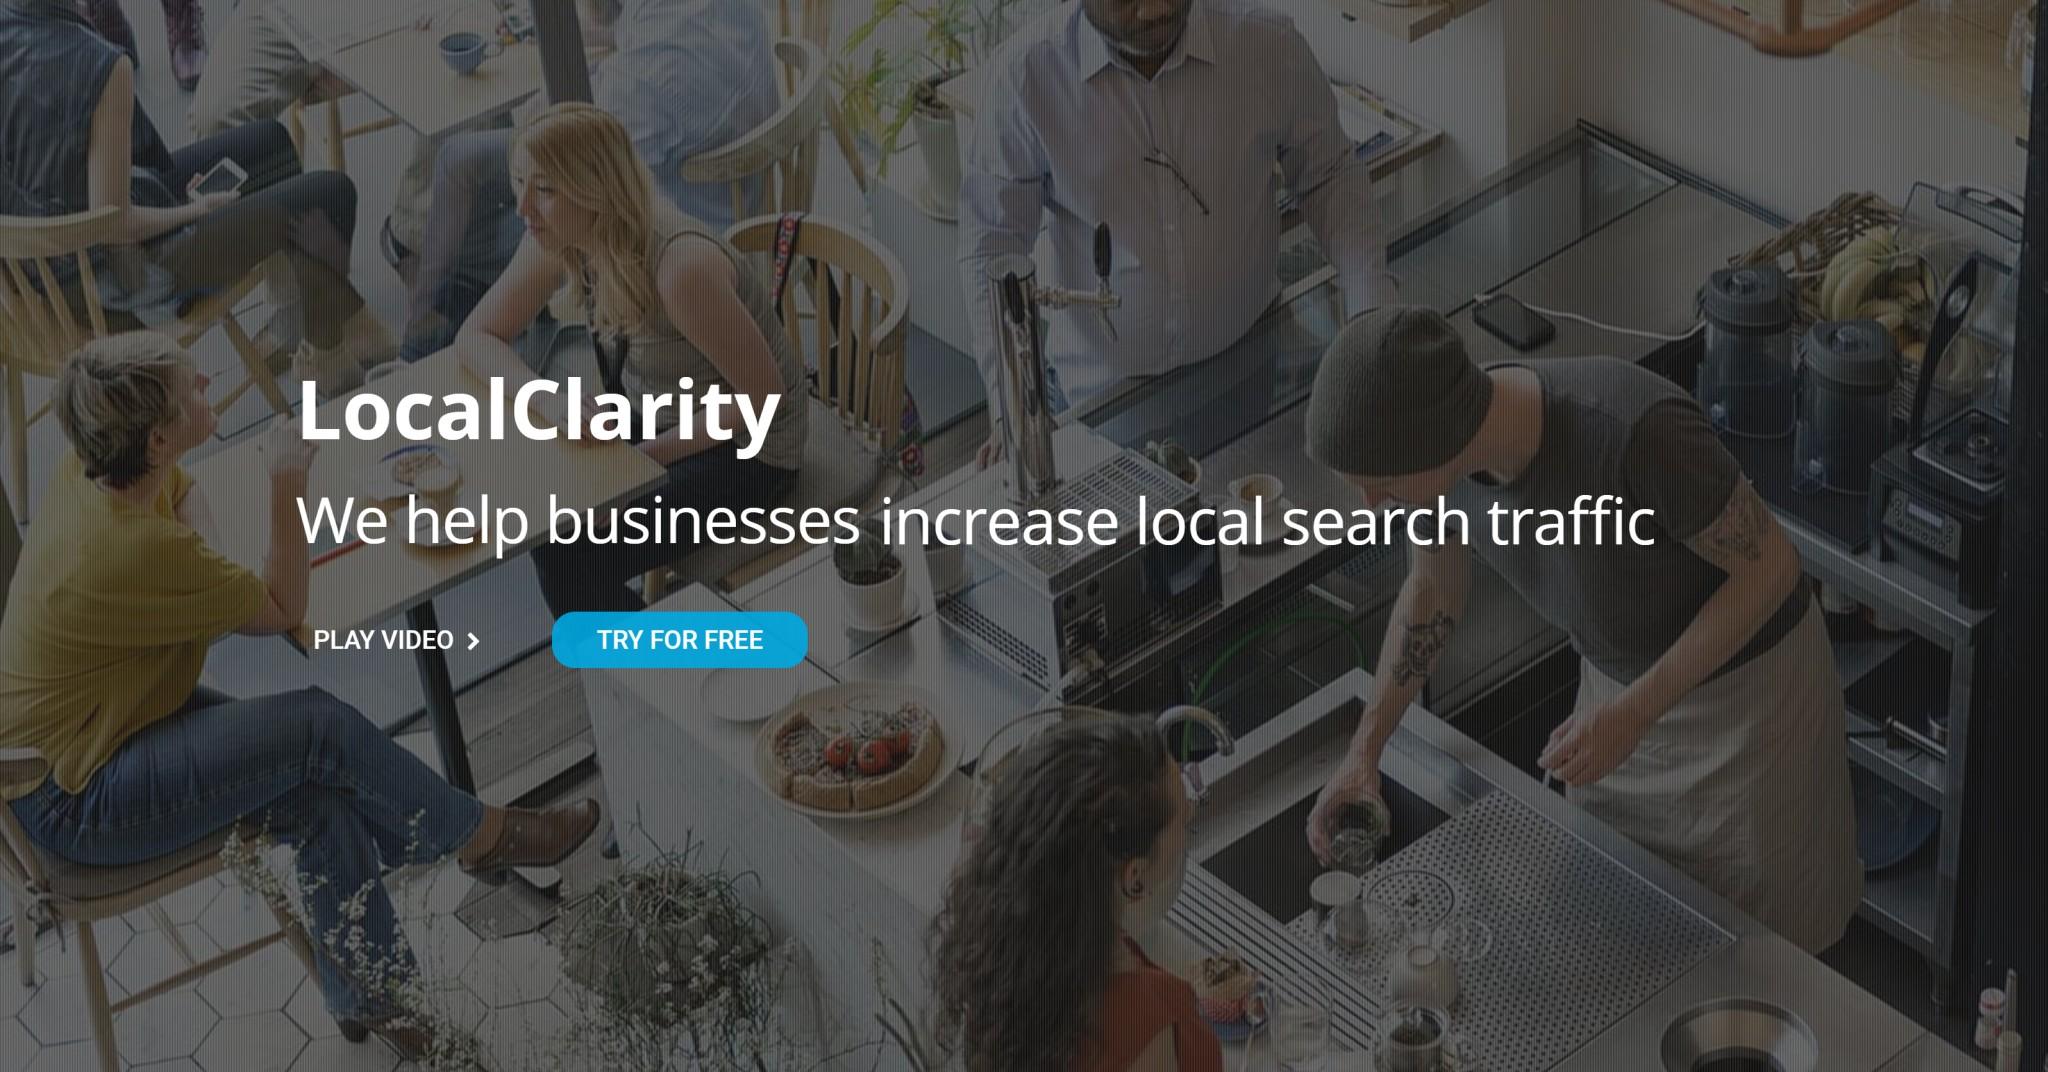 LocalClarity